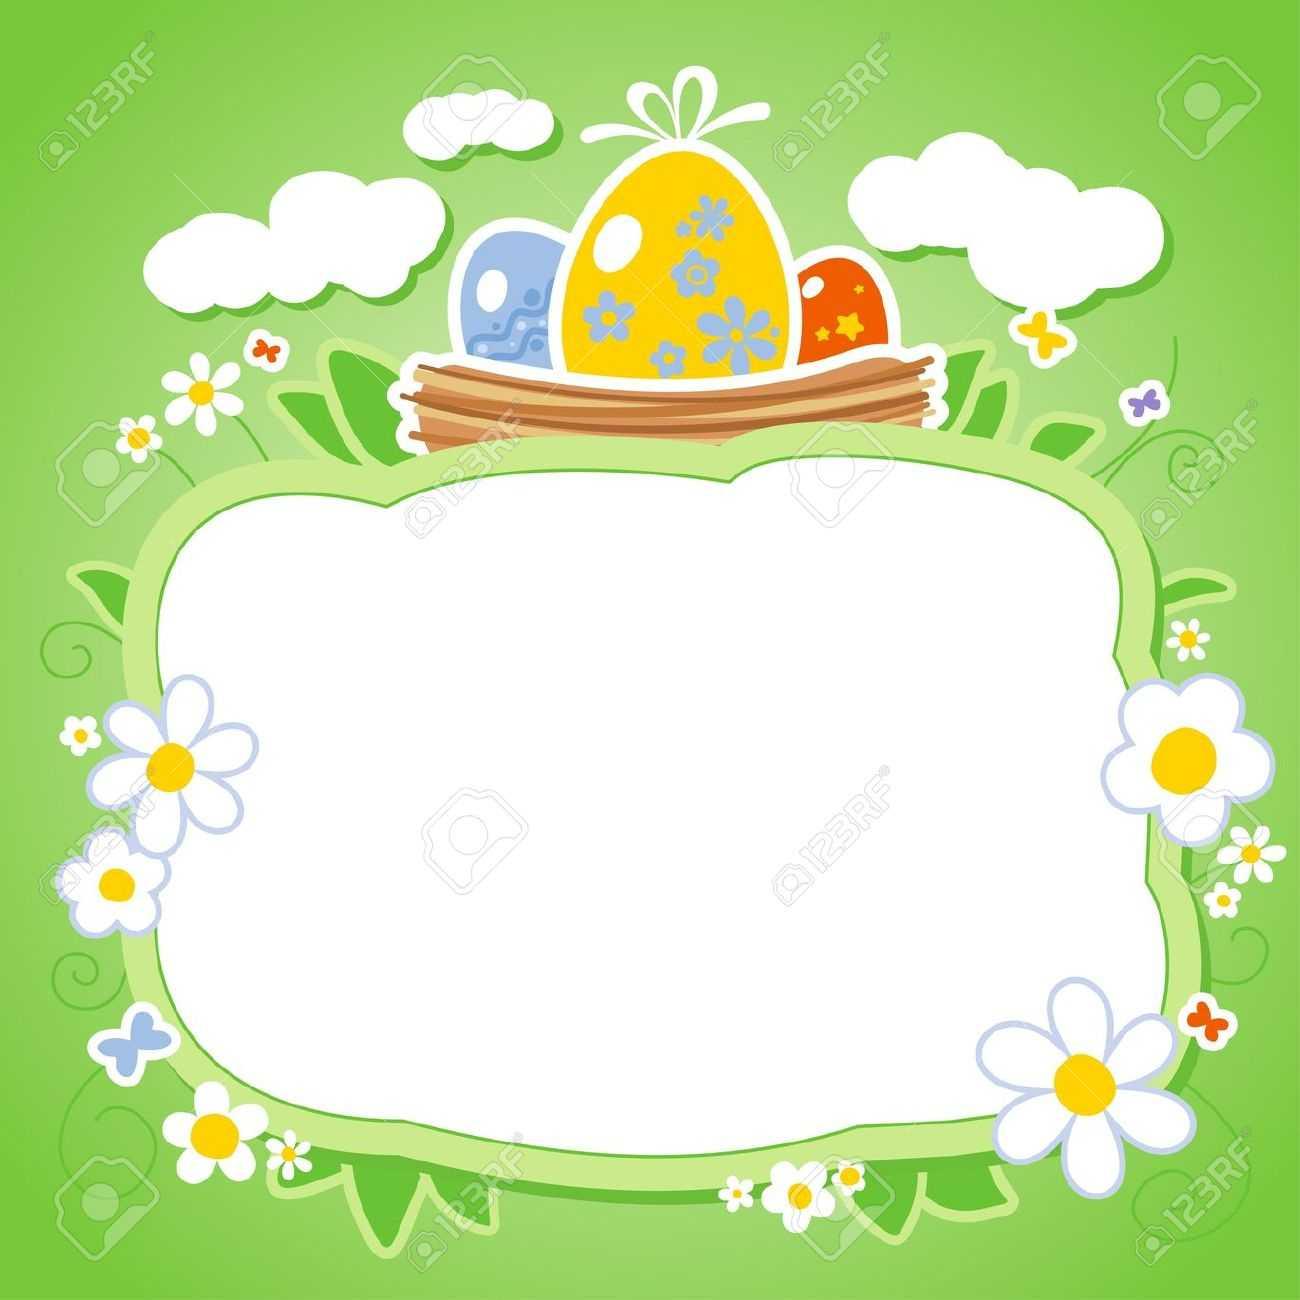 Easter Card Designs Ks2 Easter Card Template Design Easter With Regard To Easter Card Template Ks2